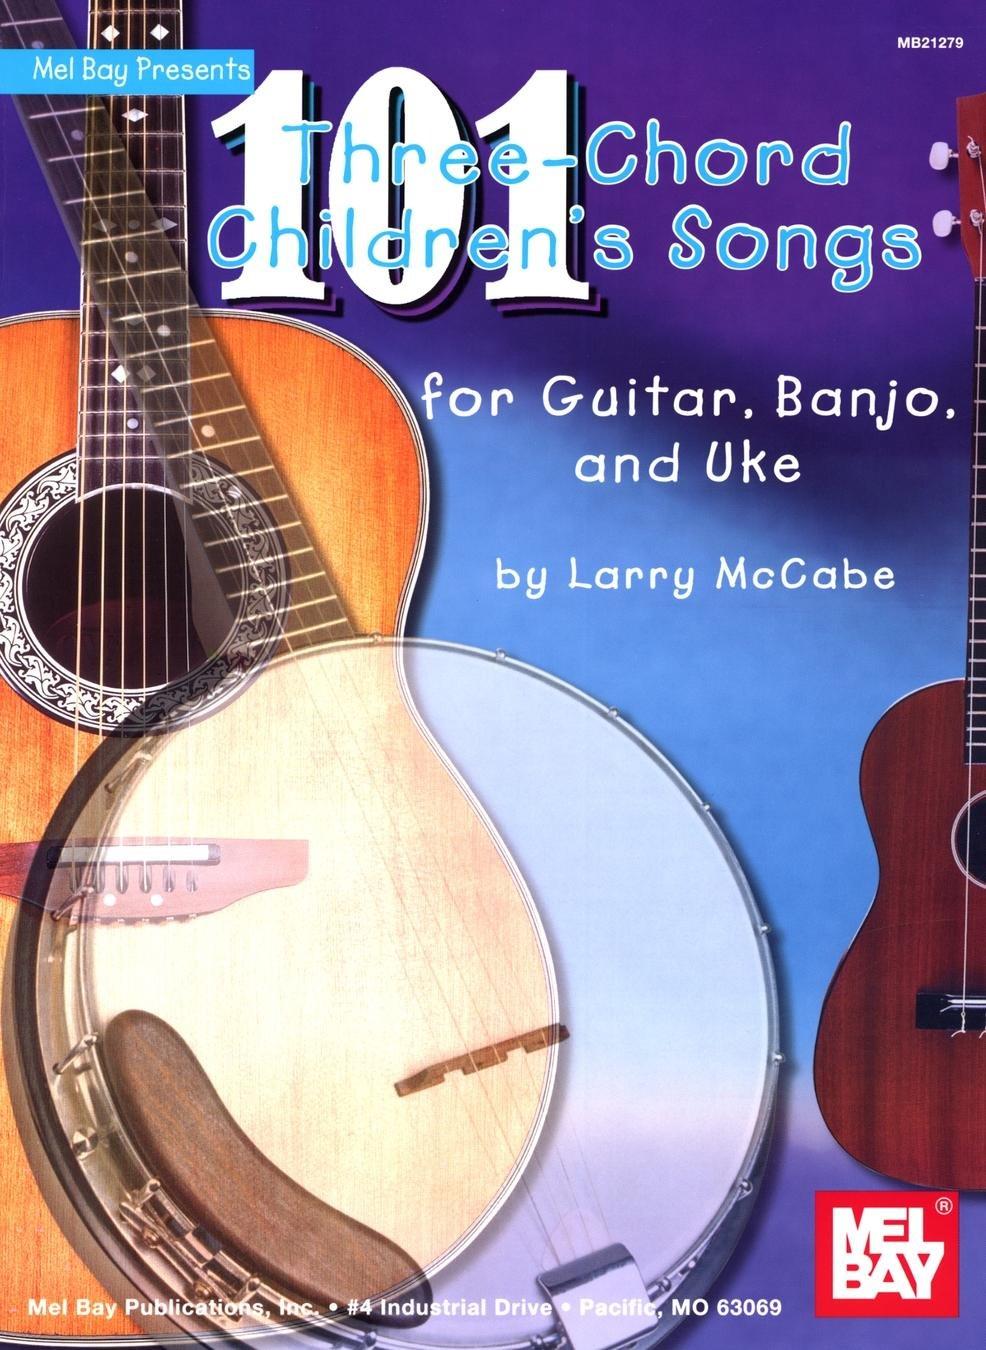 Amazon.com: 101 Three-Chord Children's Songs For Guitar, Banjo, And Uke  (0796279104432): Books